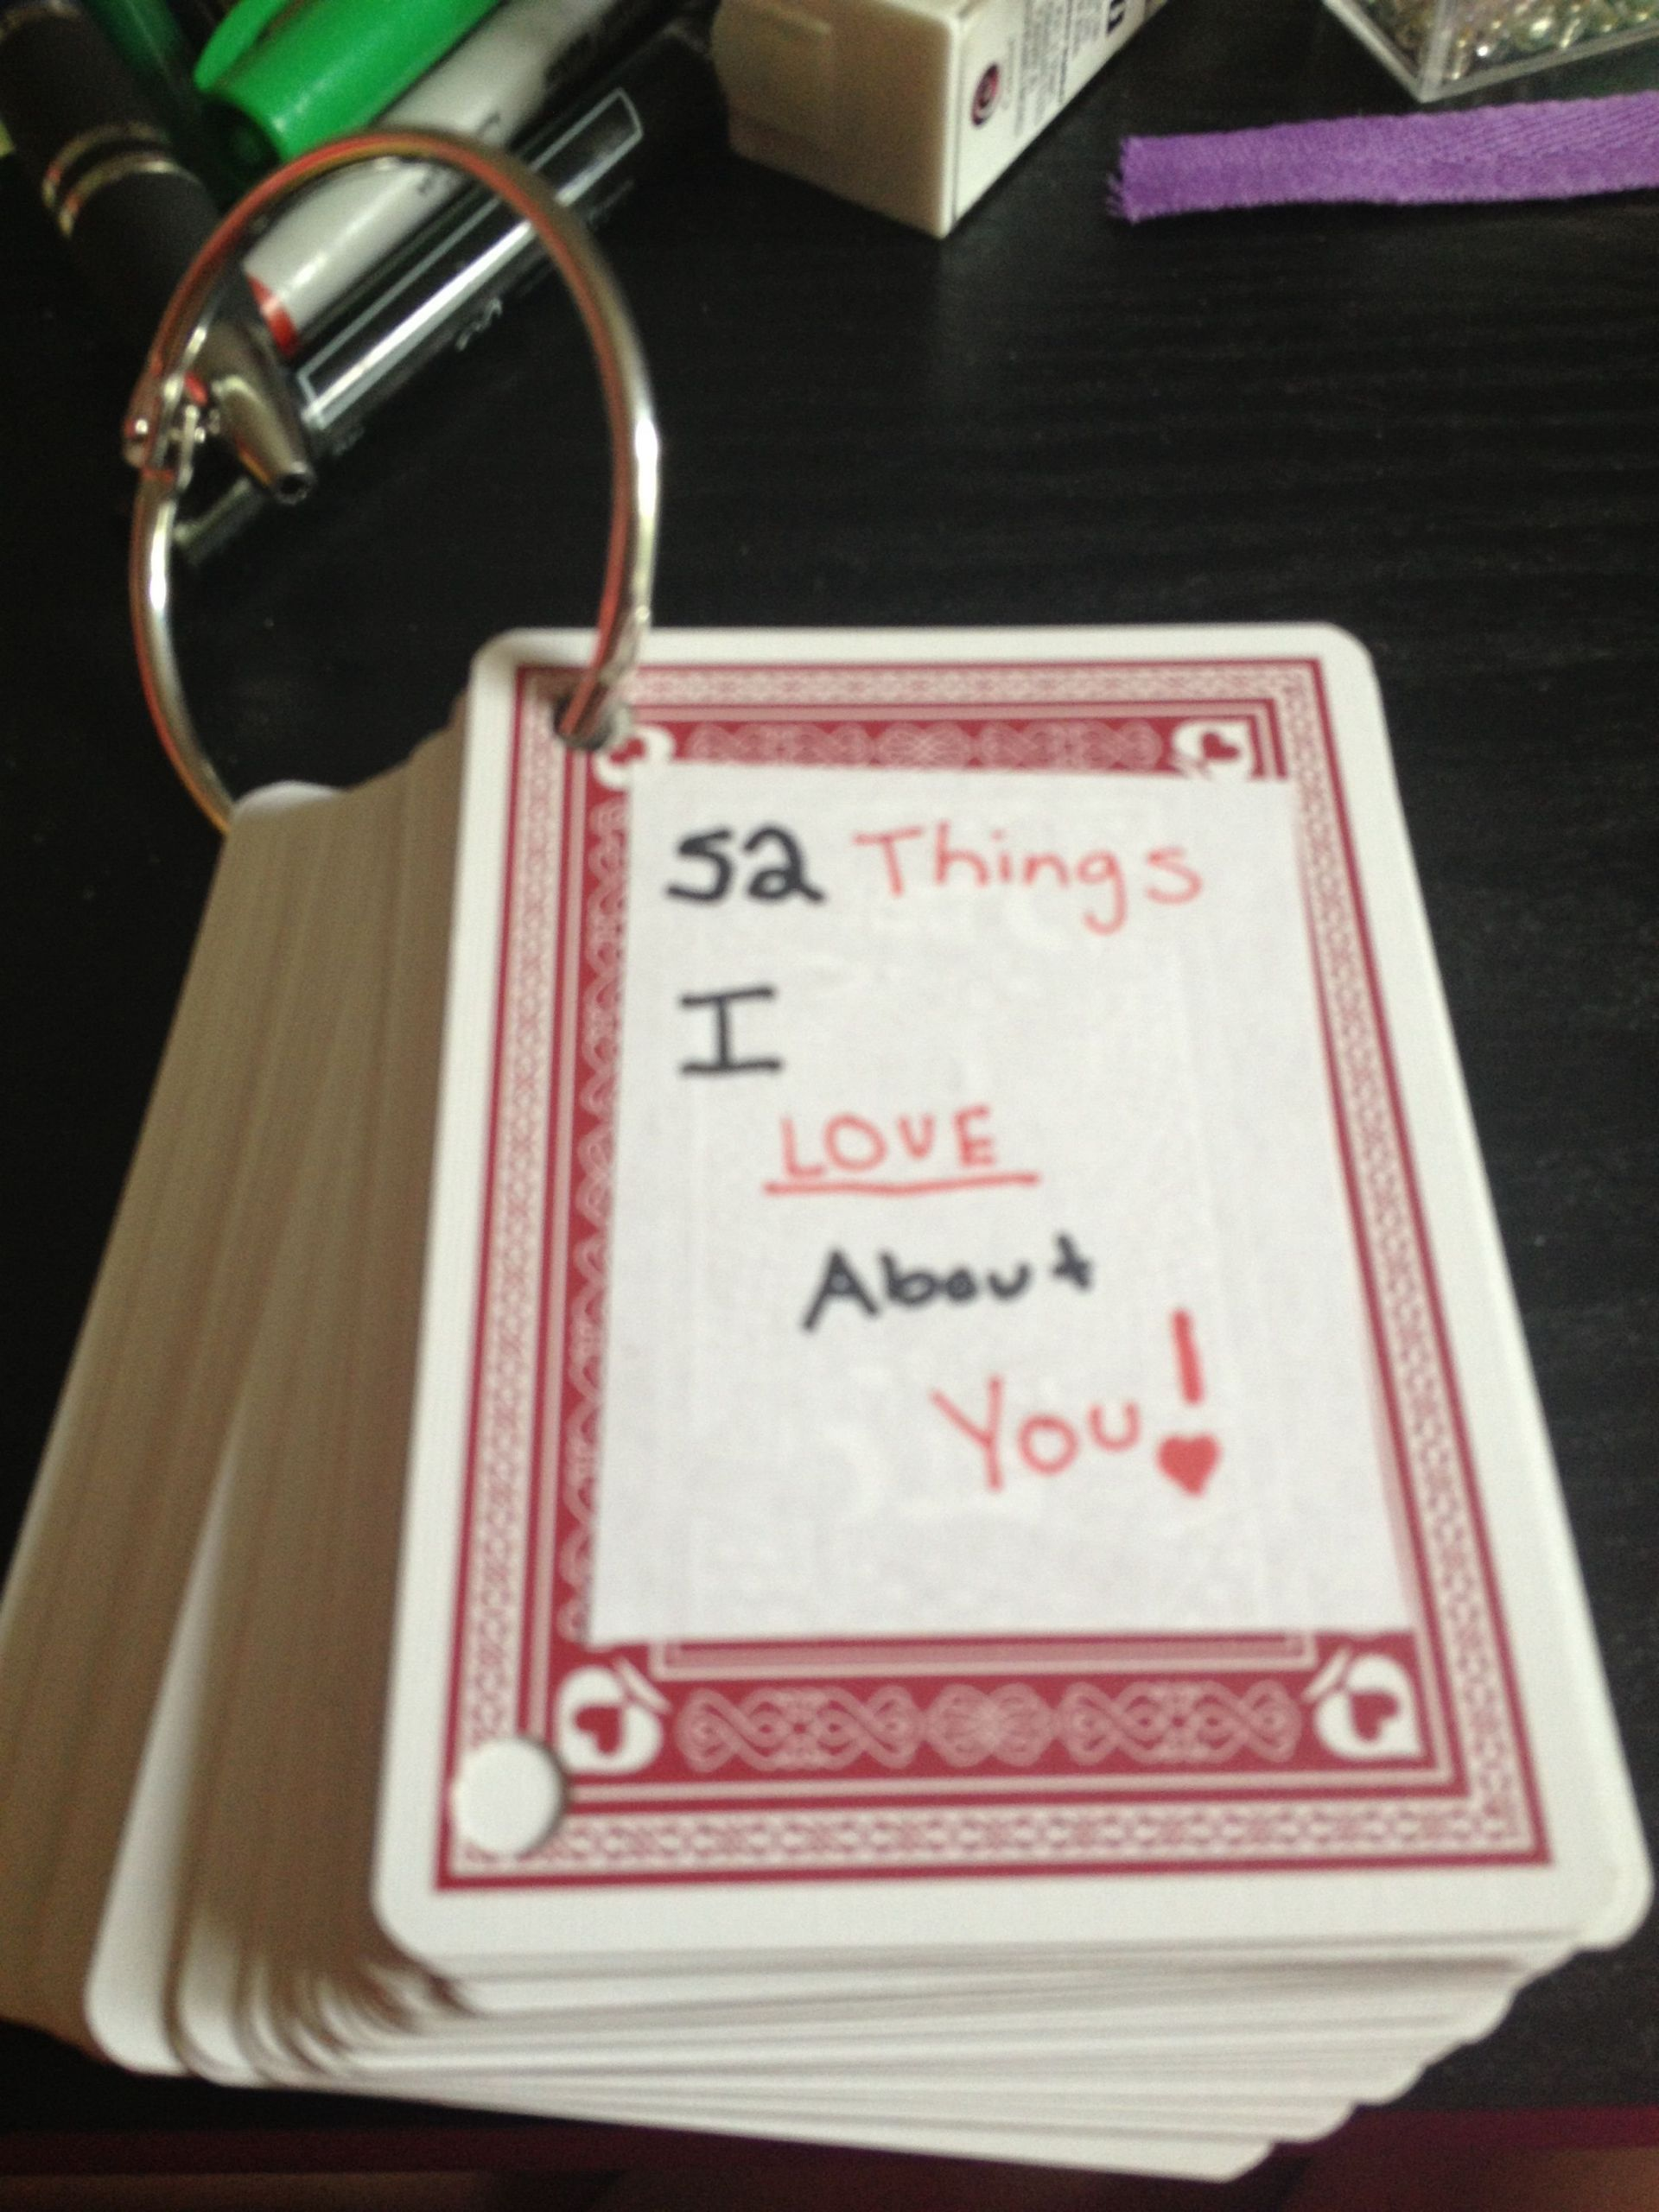 Sentimental Gift Ideas For Boyfriend  10 Attractive Sentimental Gift Ideas For Boyfriend 2019